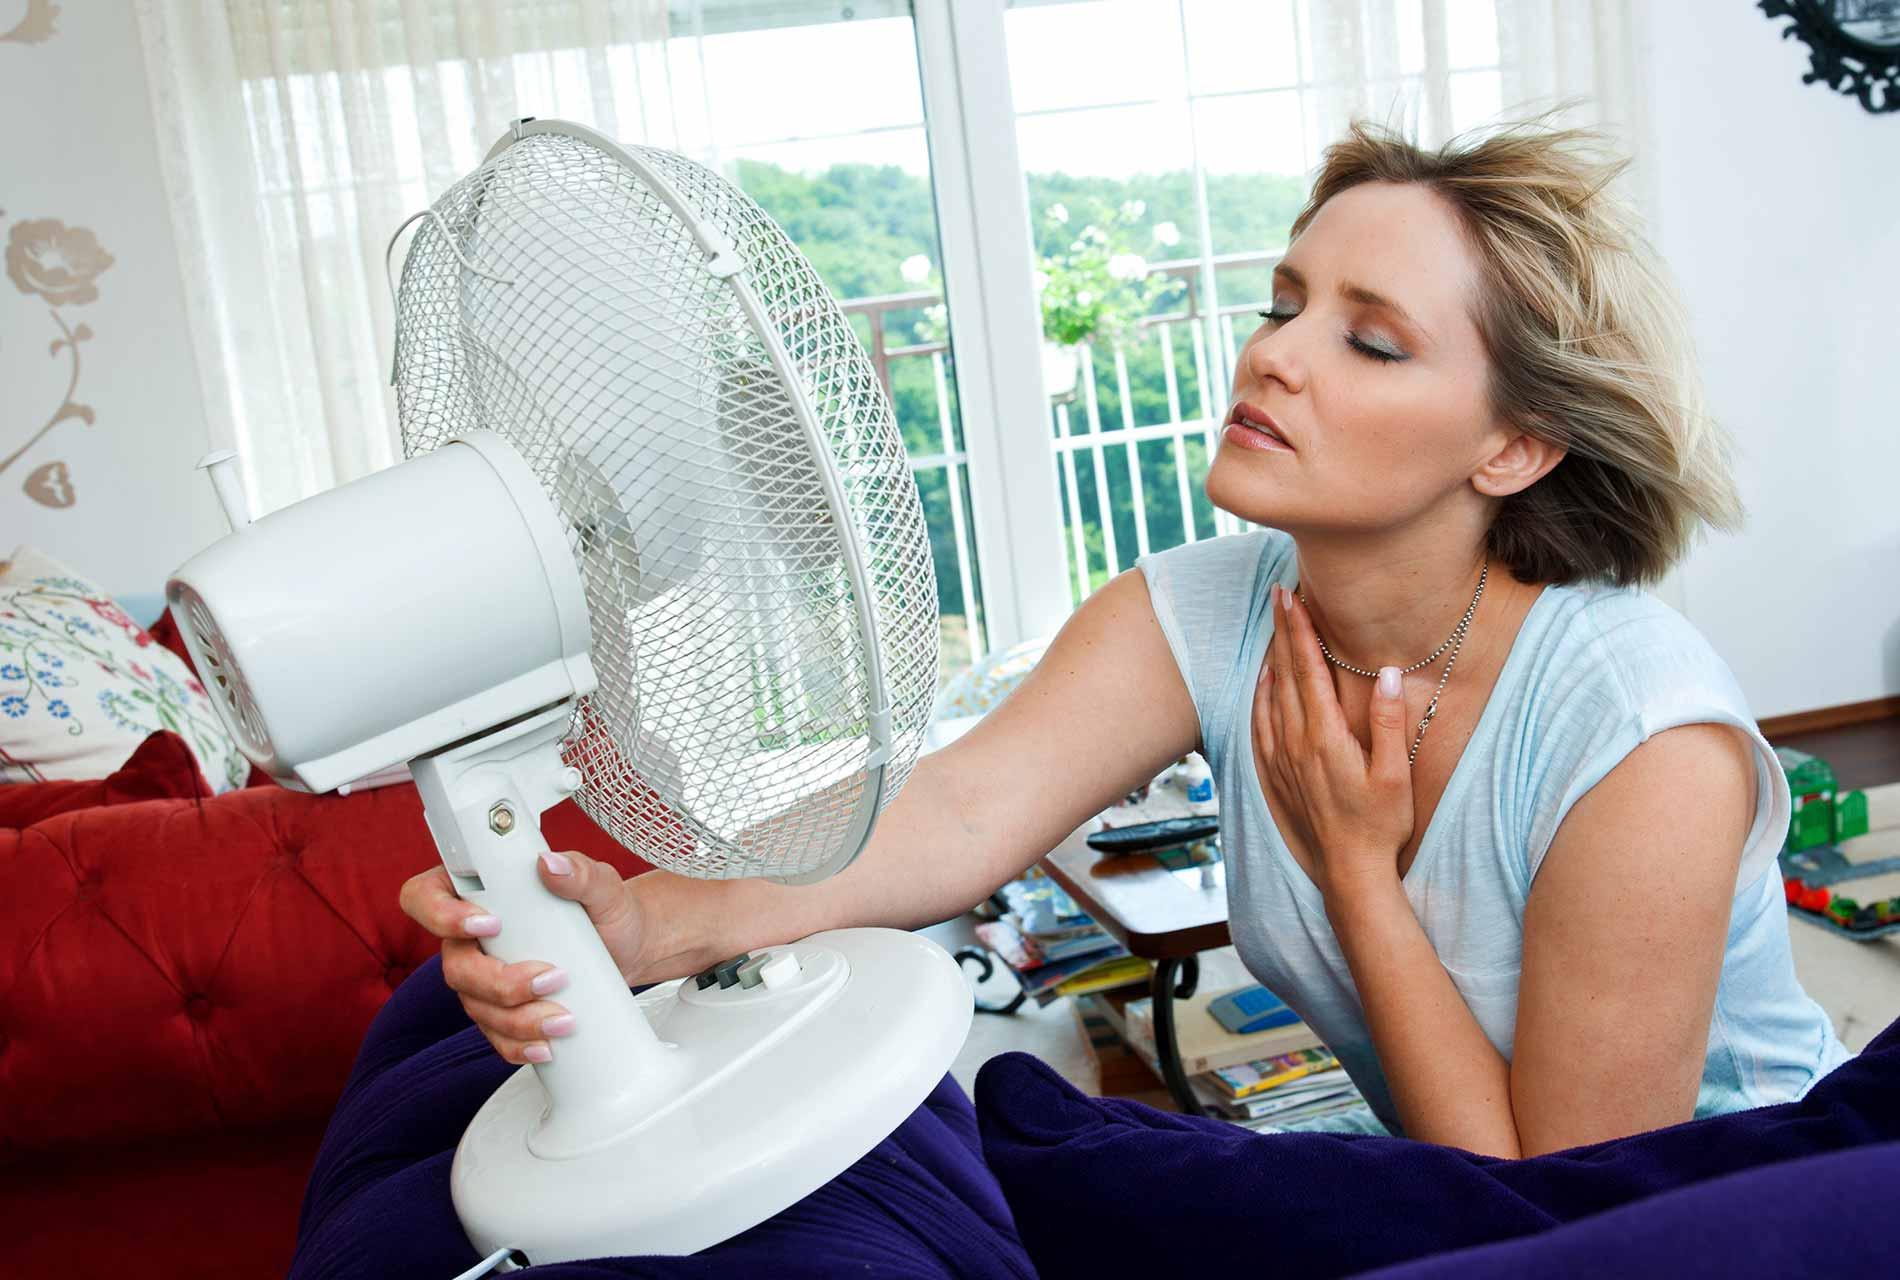 Abkühlung durch Ventilator - mobile Klimageräte